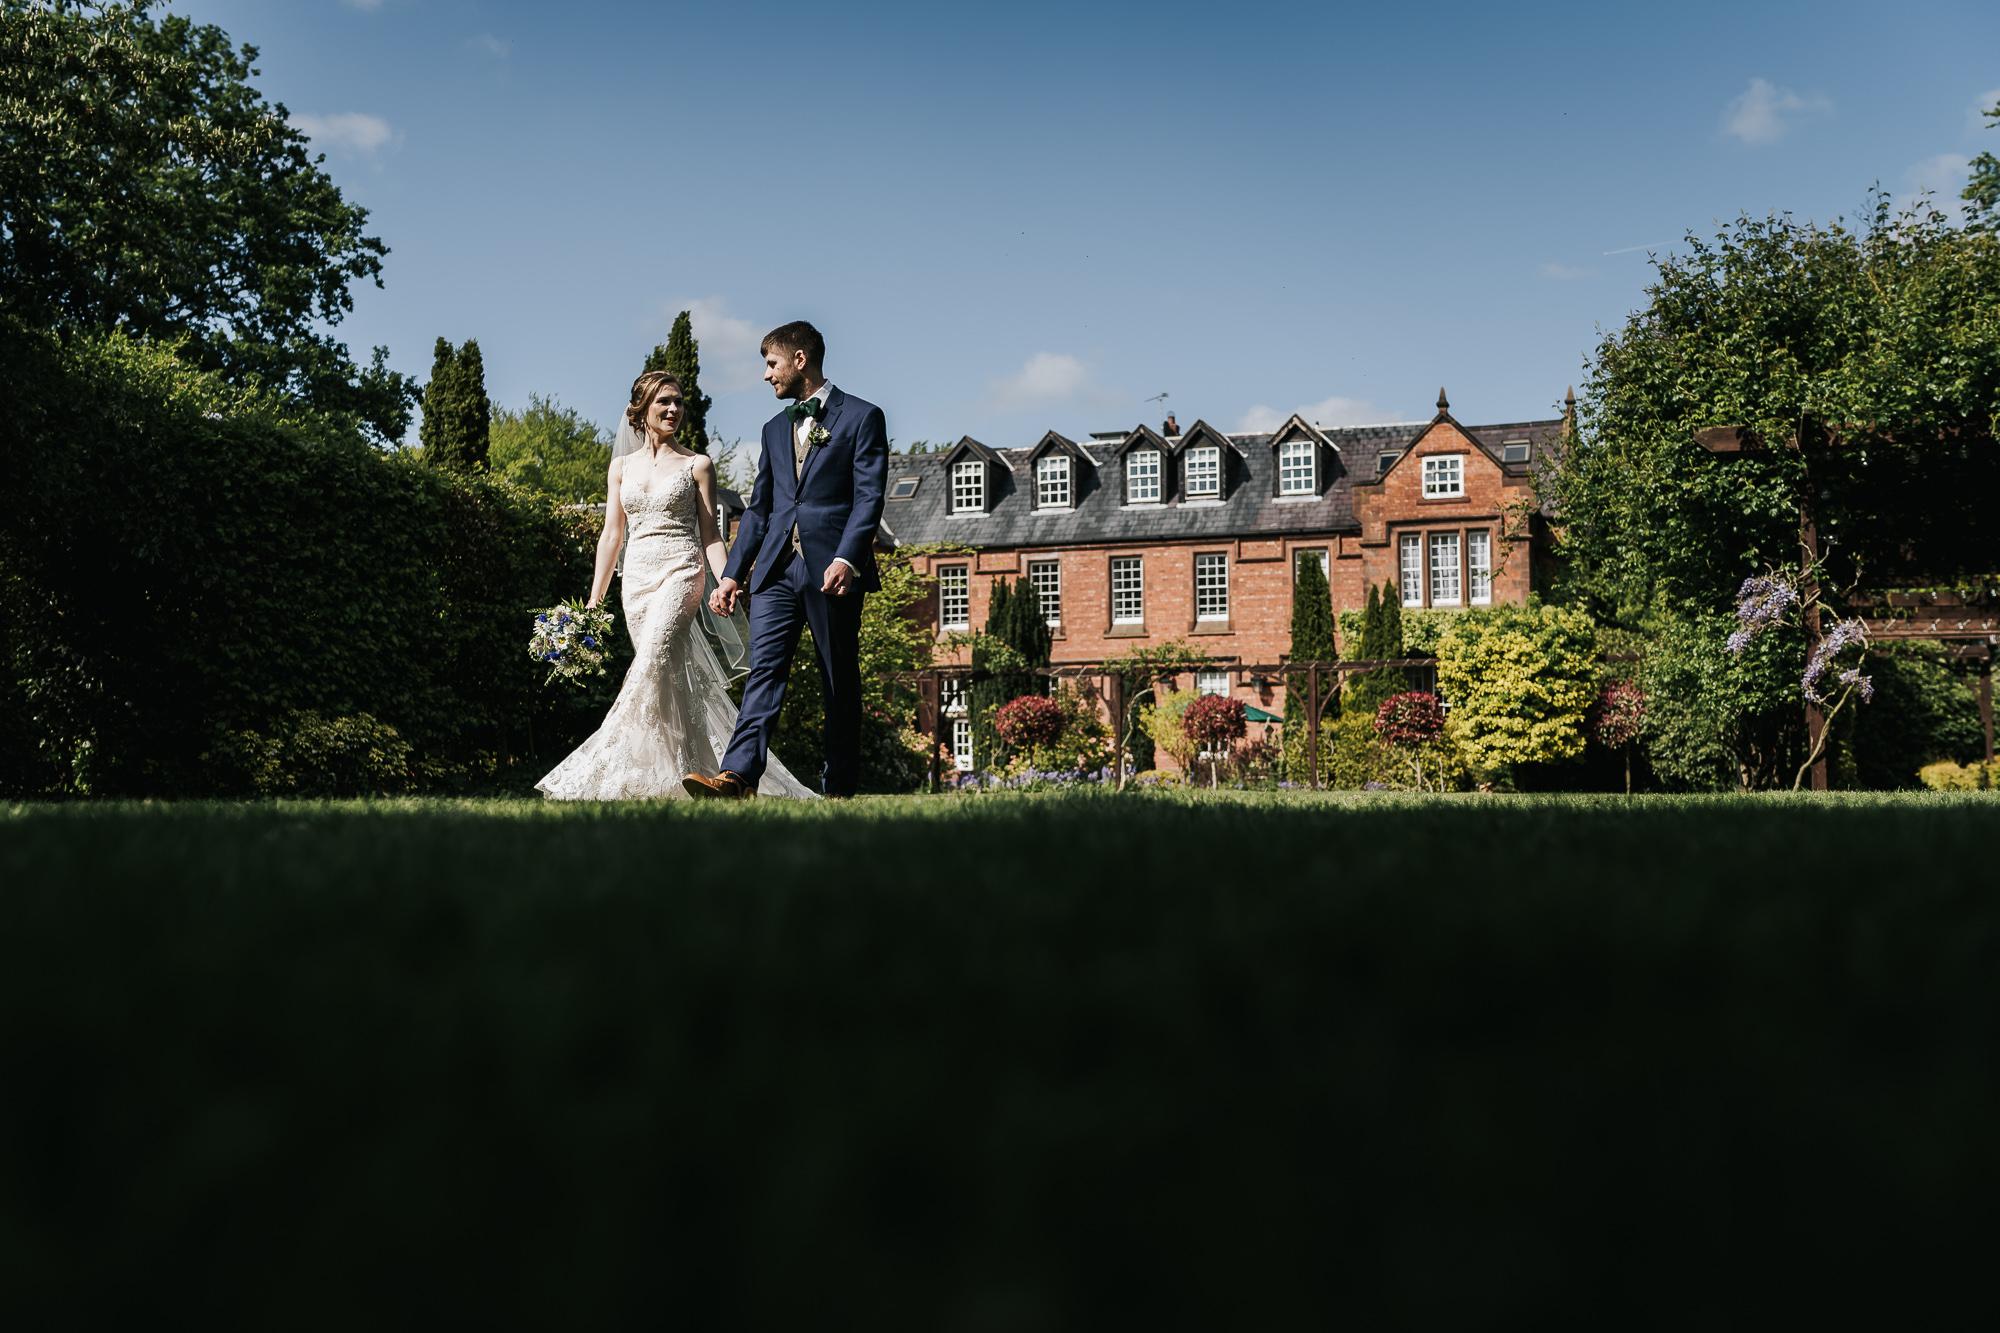 Nunsmere Hall Hotel Wedding photograhpy in cheshire wedding photographer (28 of 42).jpg